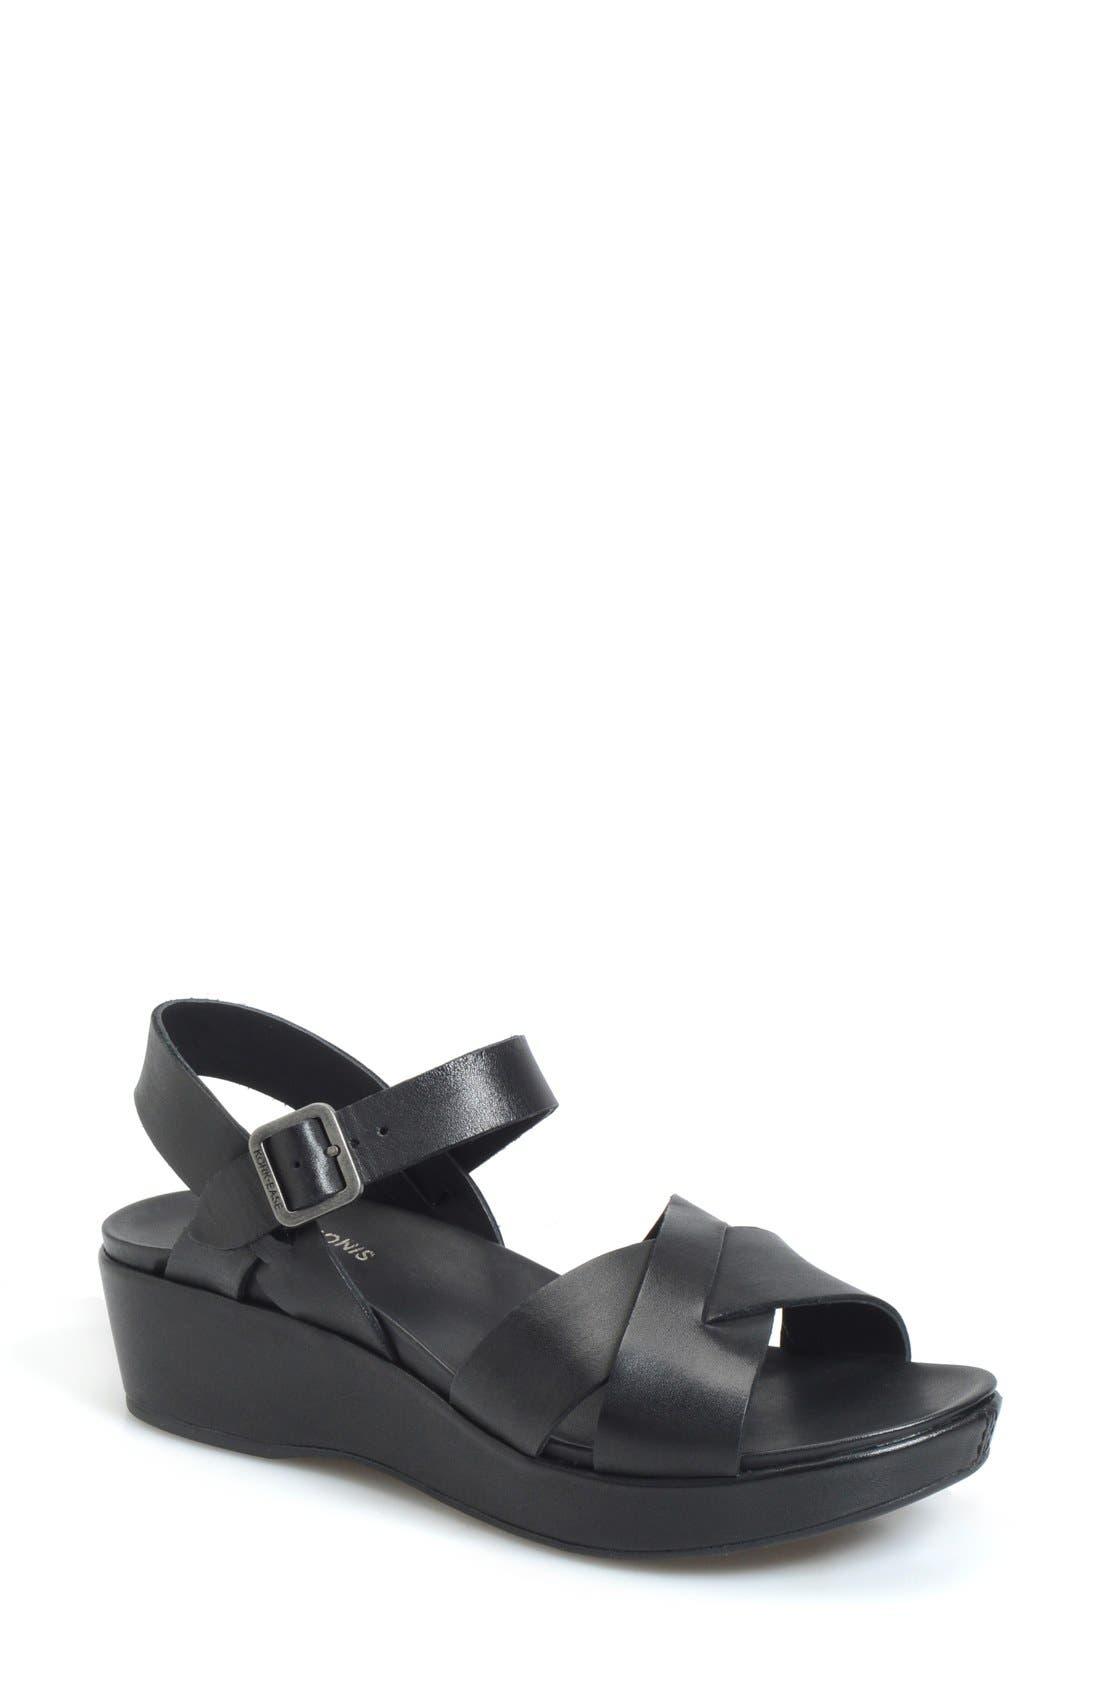 KORK-EASE<SUP>®</SUP>, 'Myrna 2.0' Cork Wedge Sandal, Main thumbnail 1, color, BLACK LEATHER